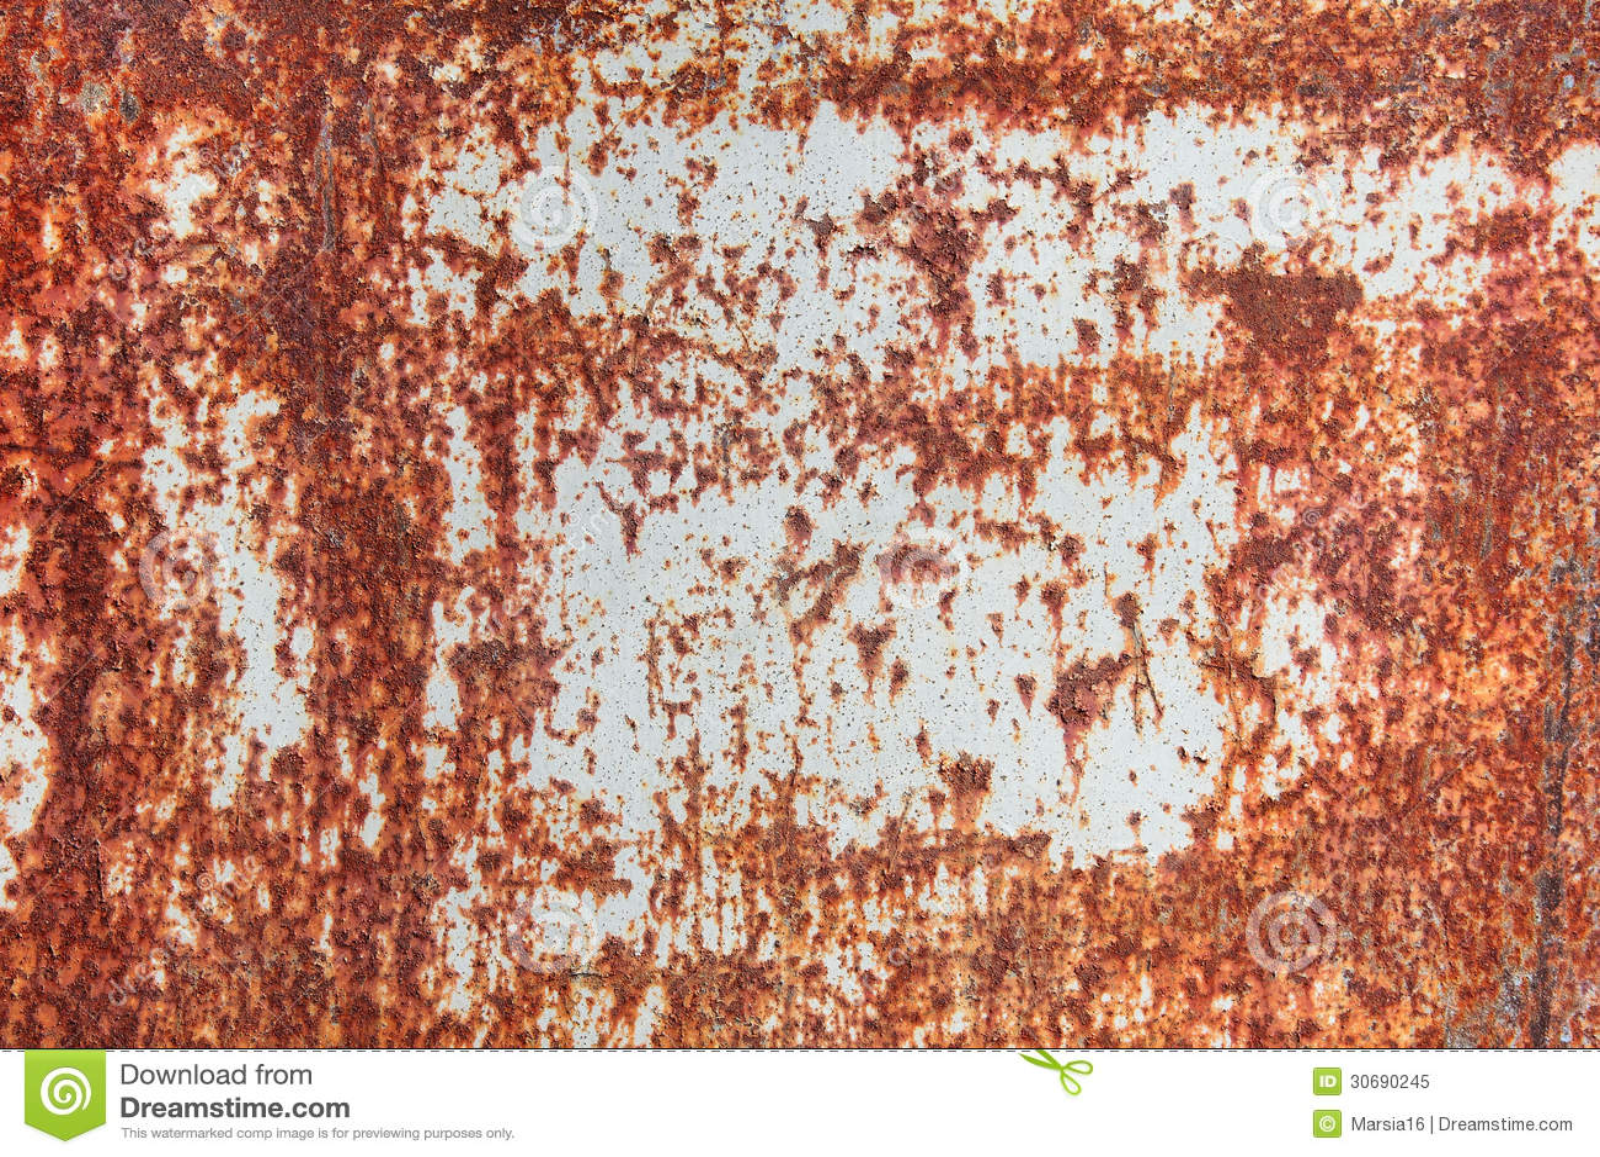 rusty surface royalty free stock photo image 30690245